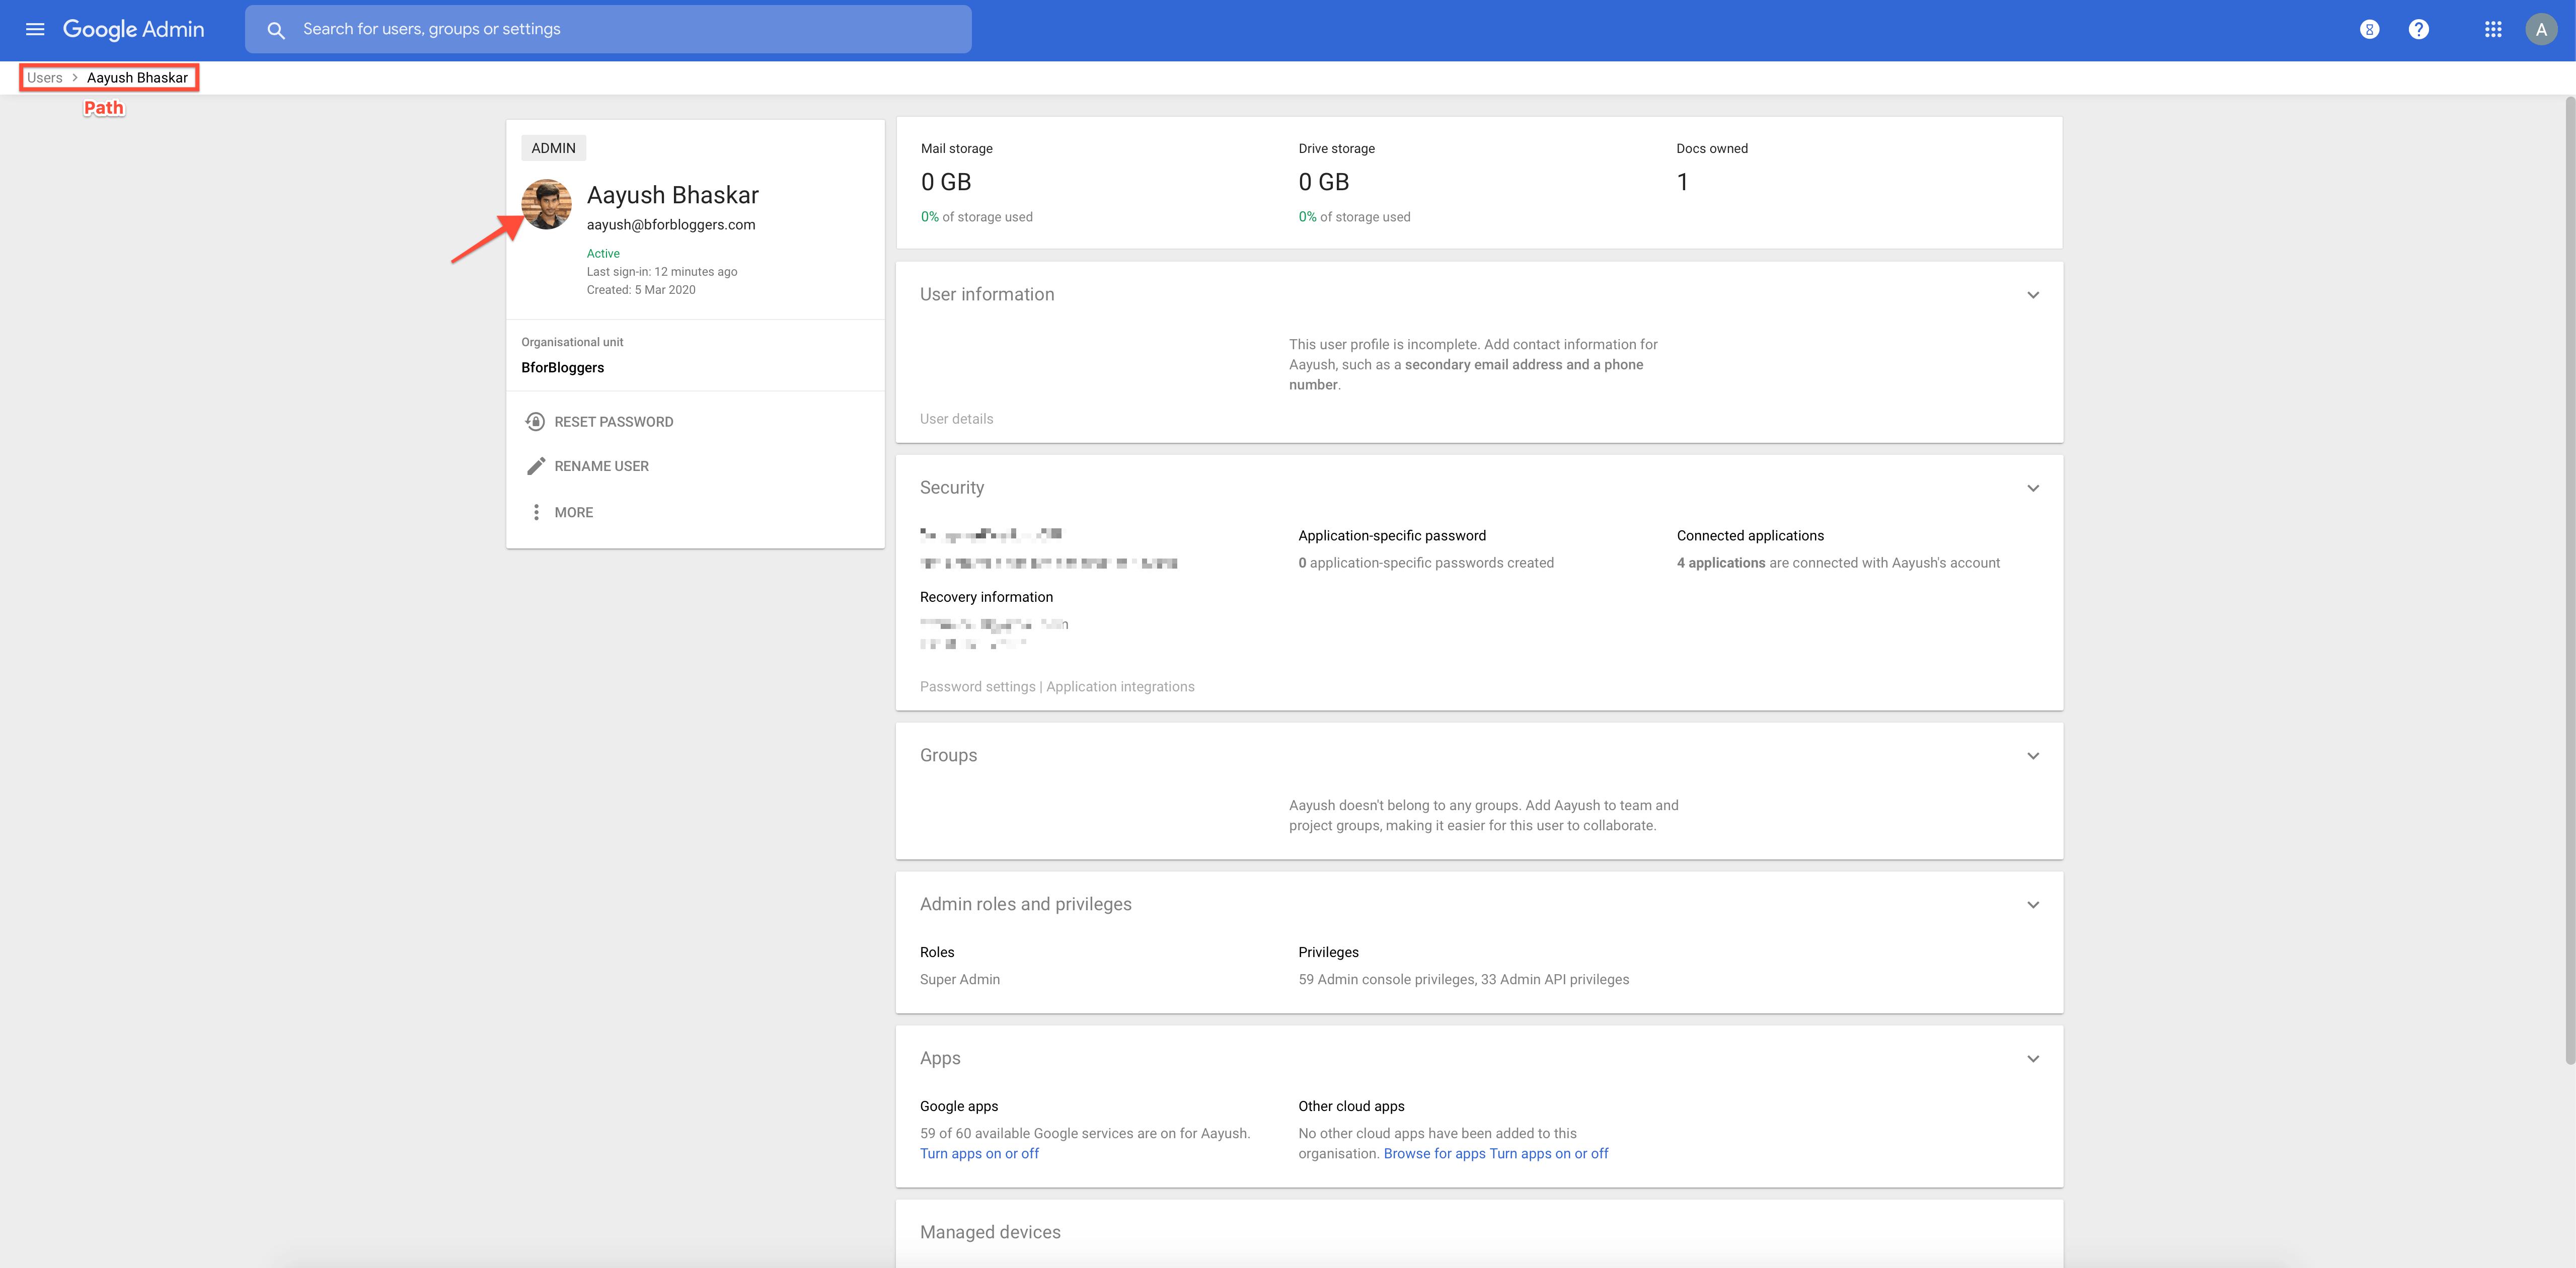 gsuite-profile-settings